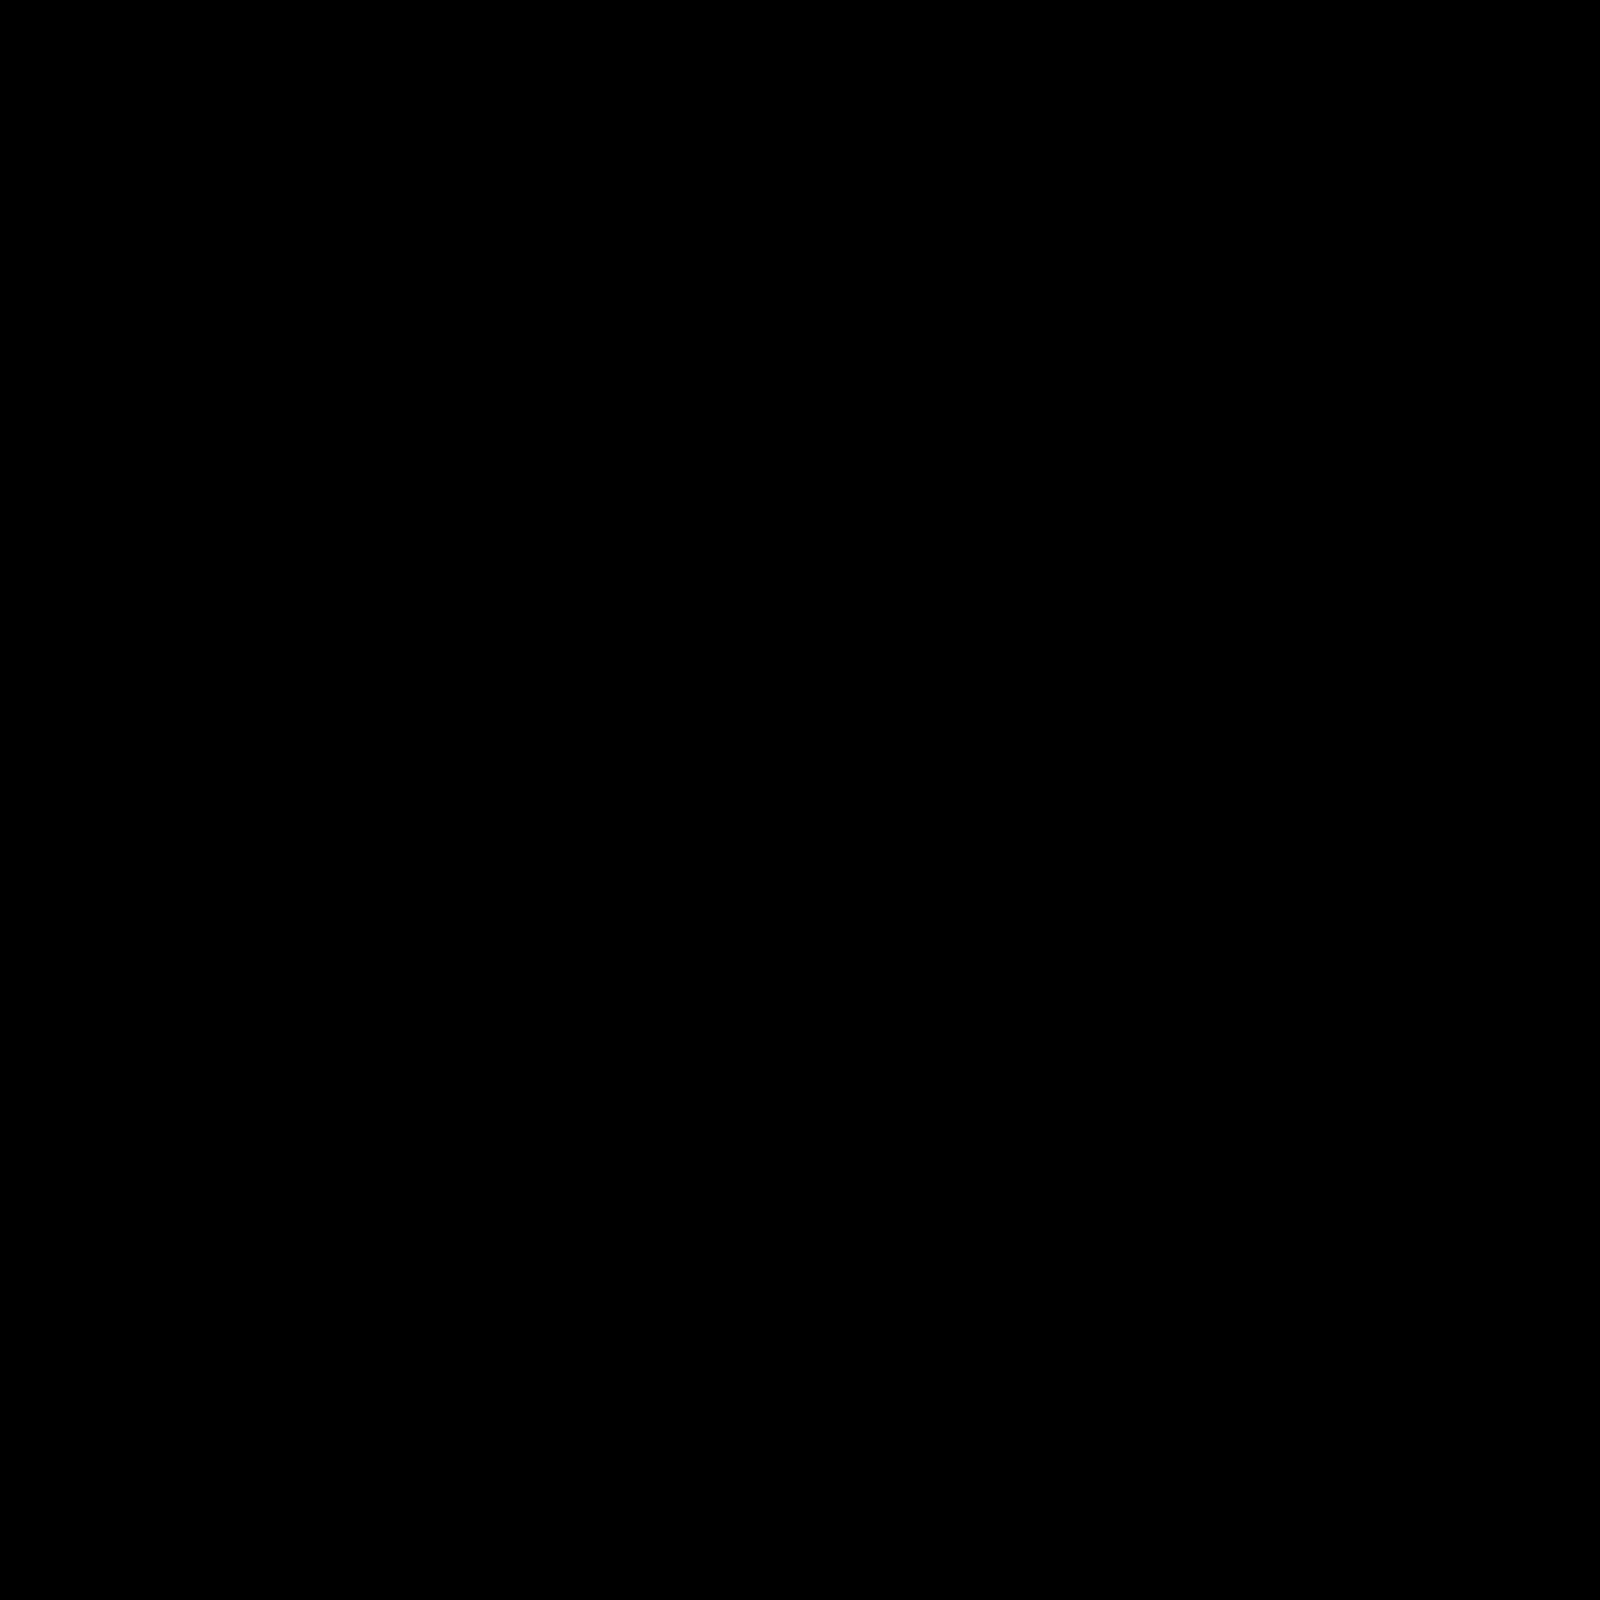 Address Book 2 icon